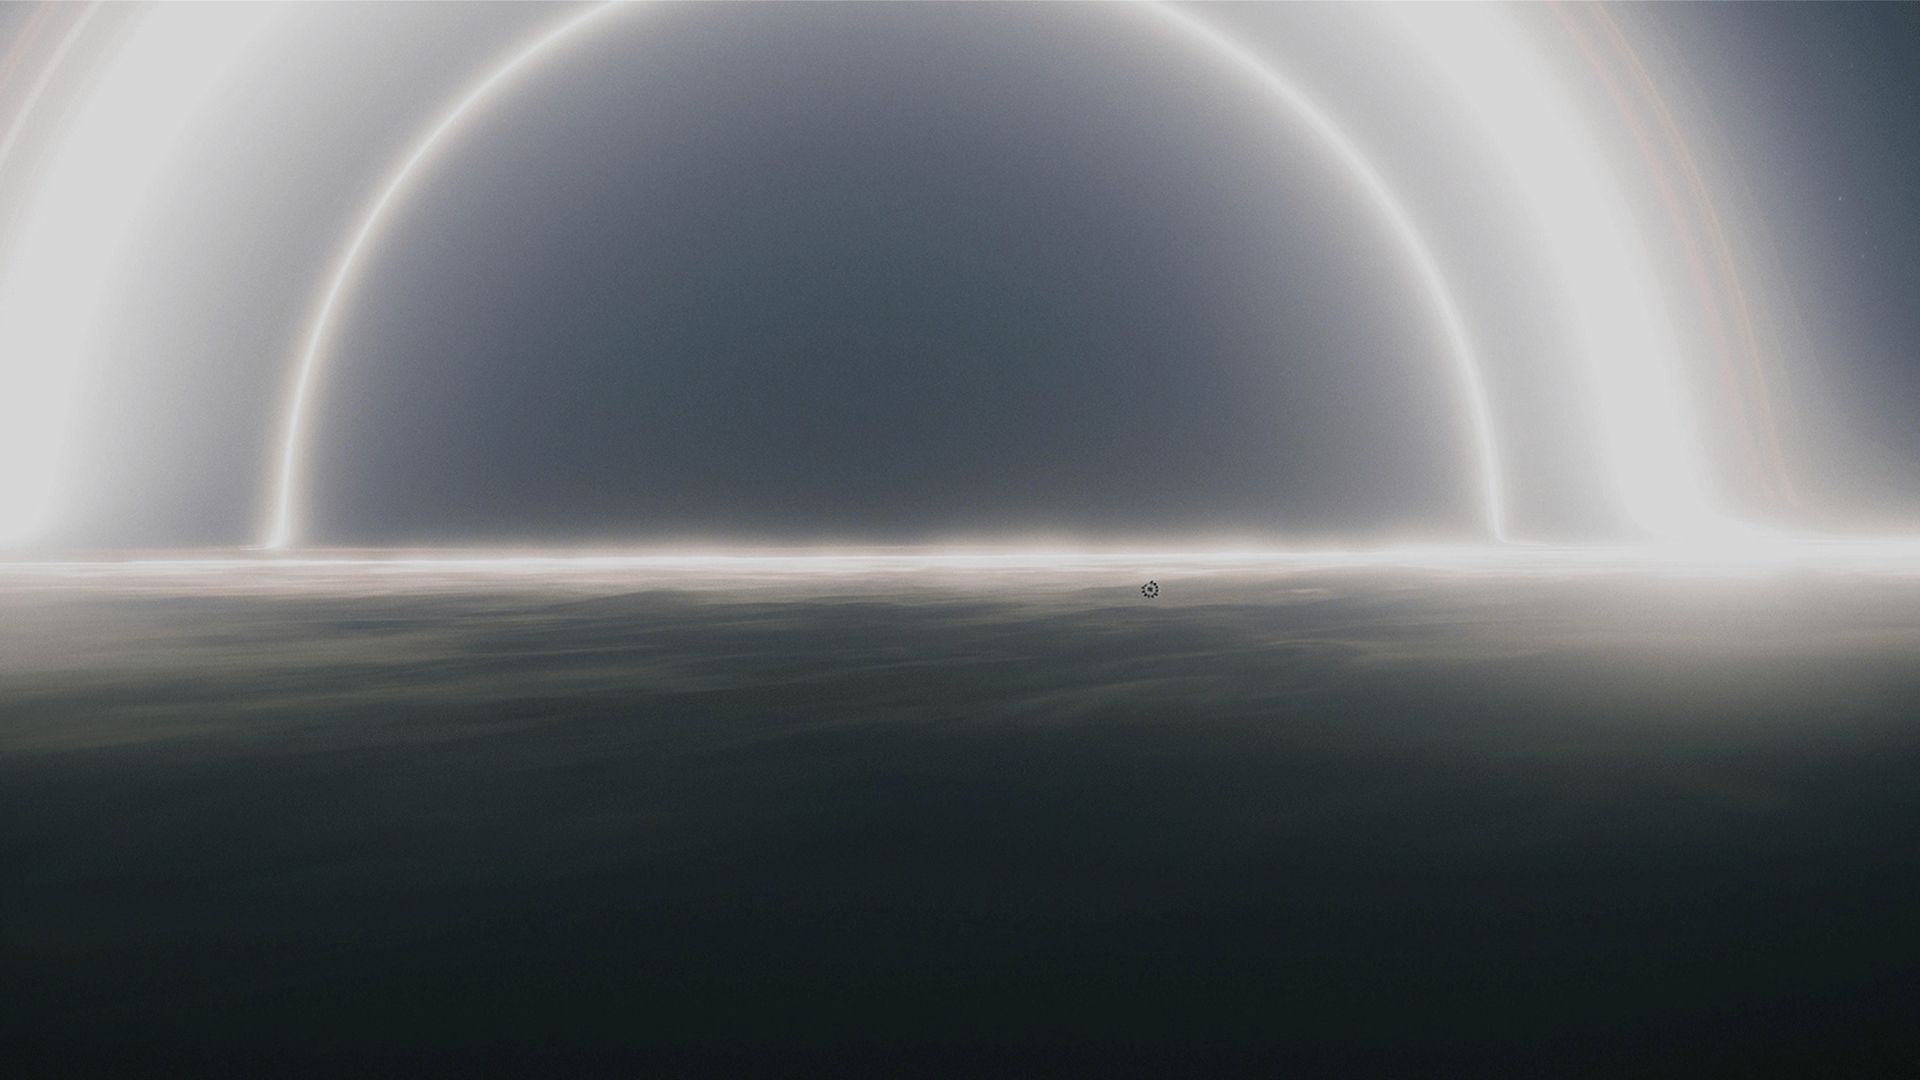 New Interstellar Wallpaper [1920x1080] - Interstellar Black Hole , HD Wallpaper & Backgrounds